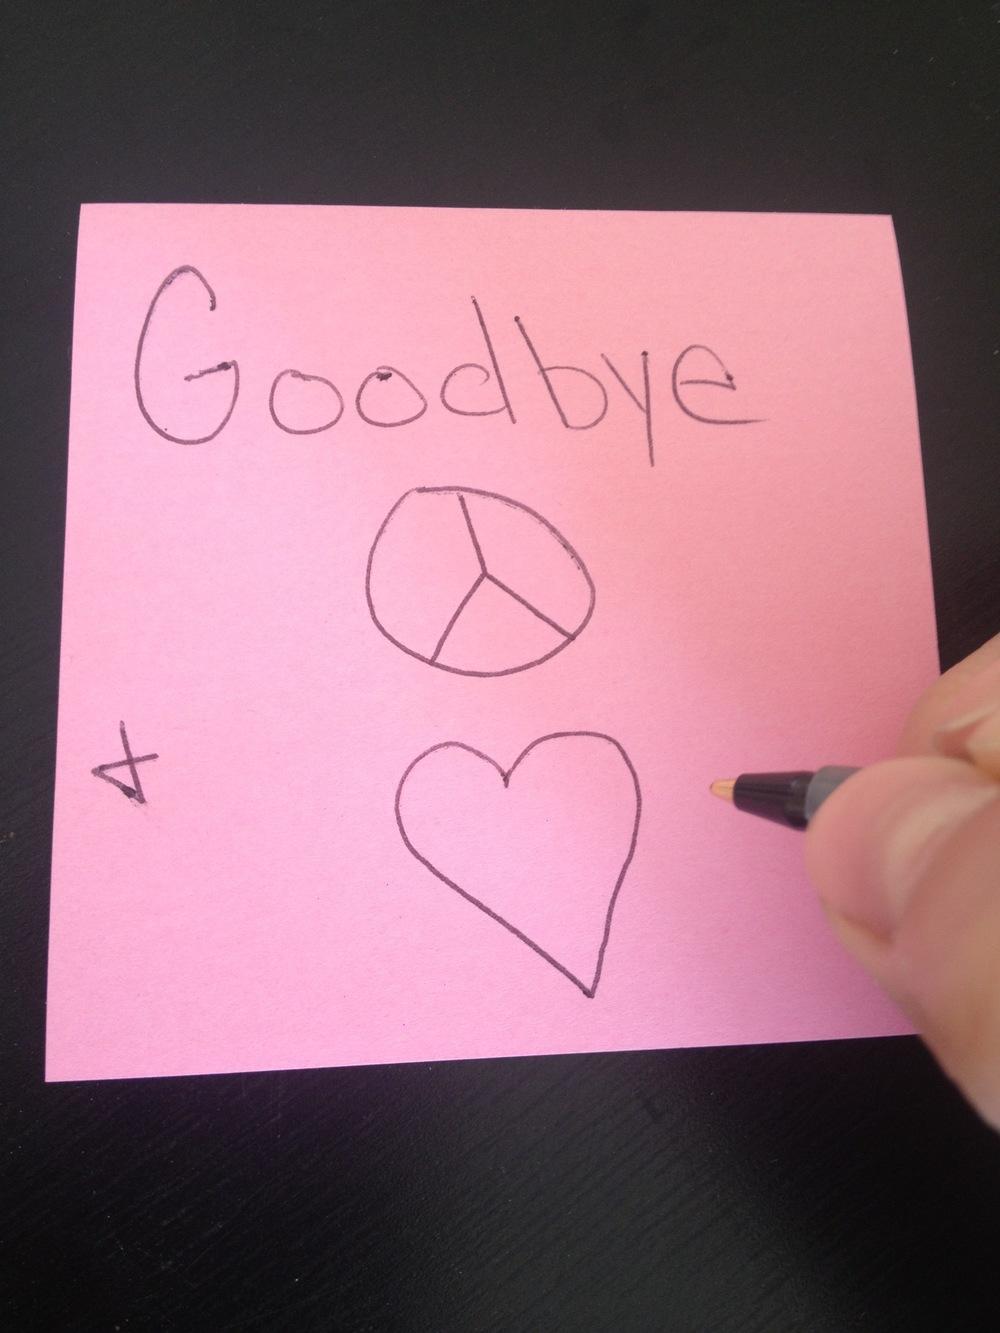 Goodbye_Manager_Caslin_Rose